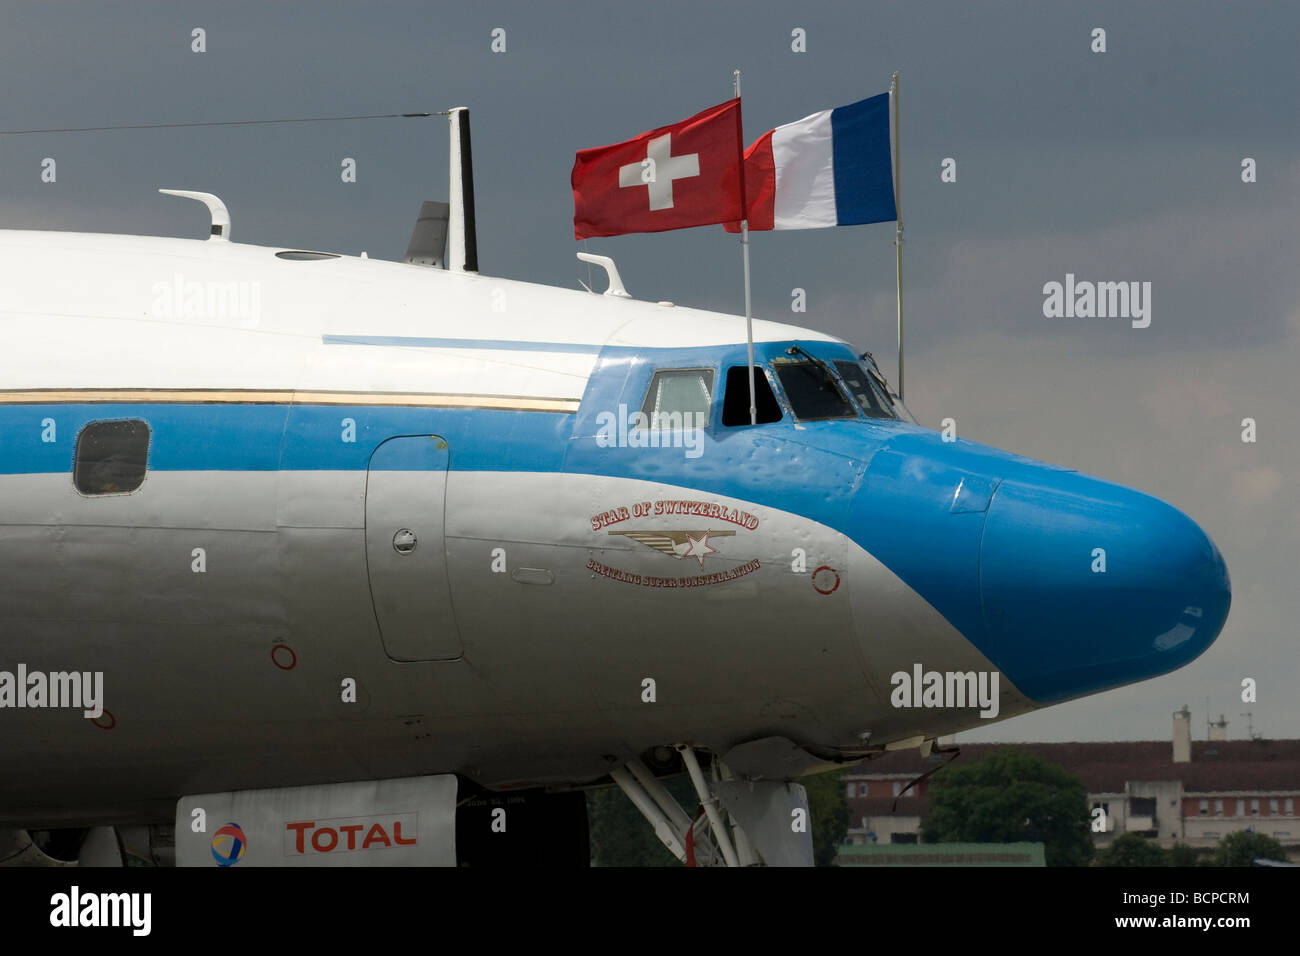 Constellation Airplane Paris Airshow 2009 - Stock Image